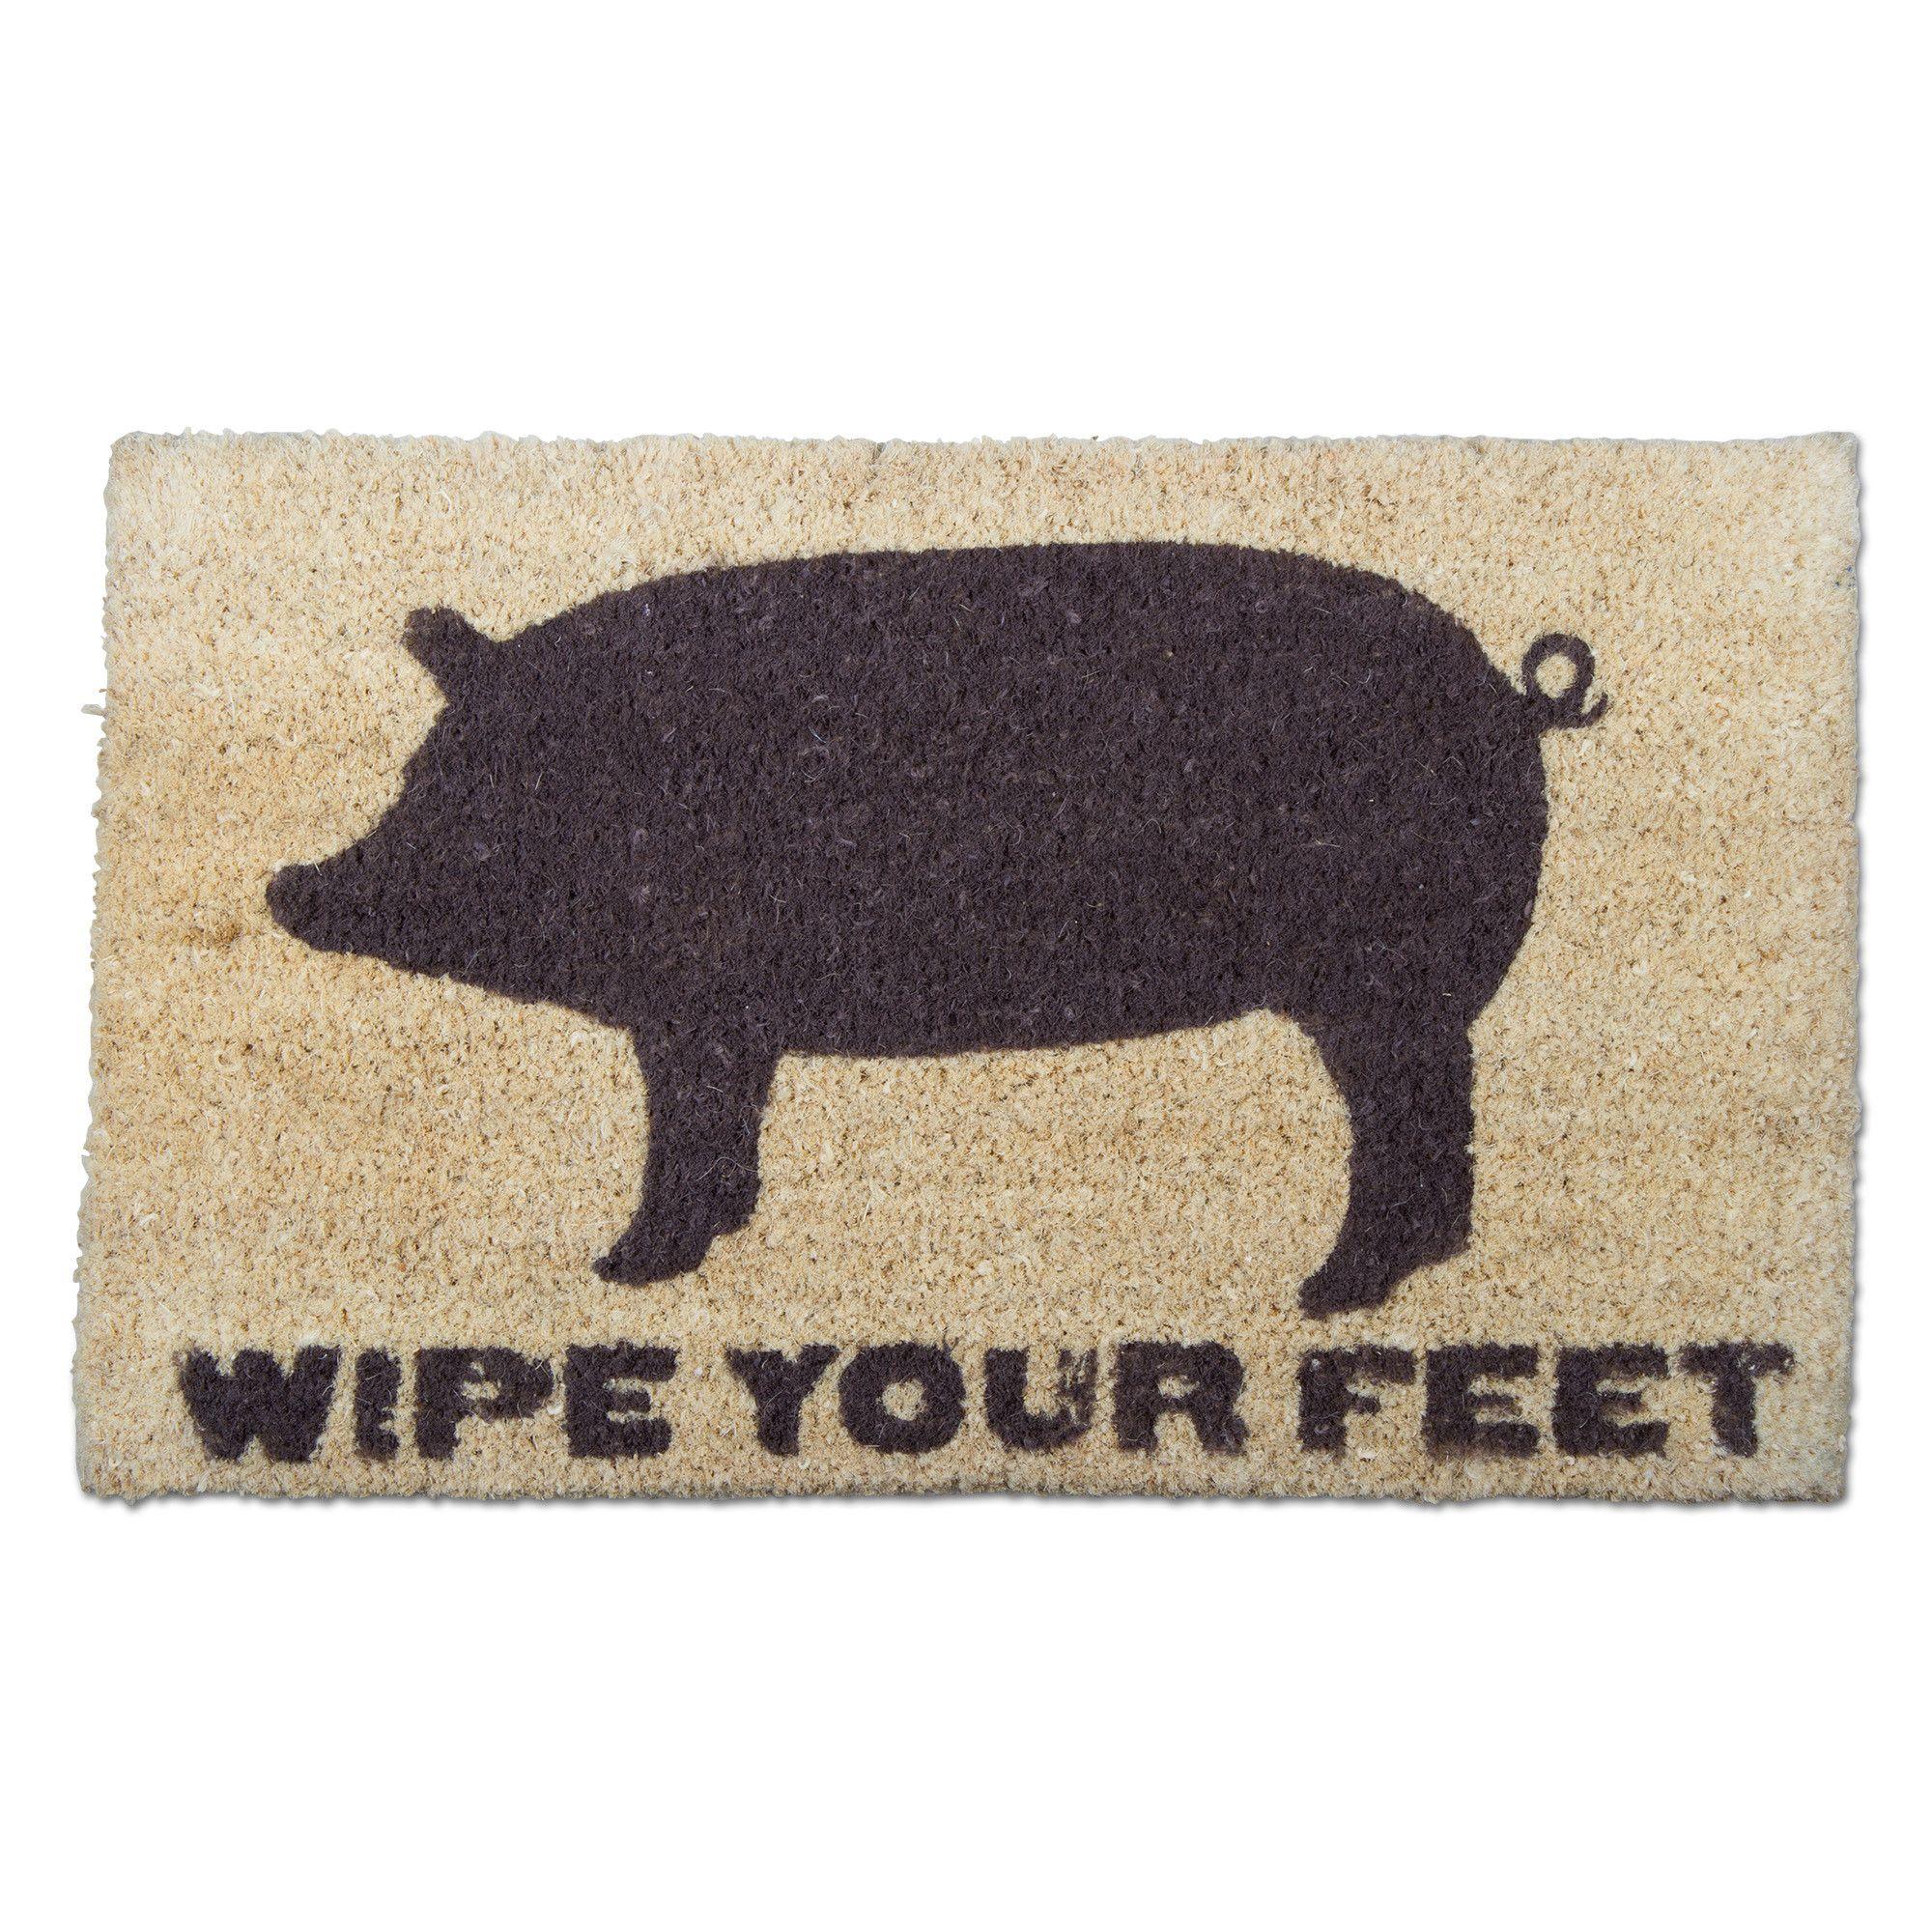 pigs sick nhf hungry mats animal health mat or wean startup farmer dsc hog national pig vs